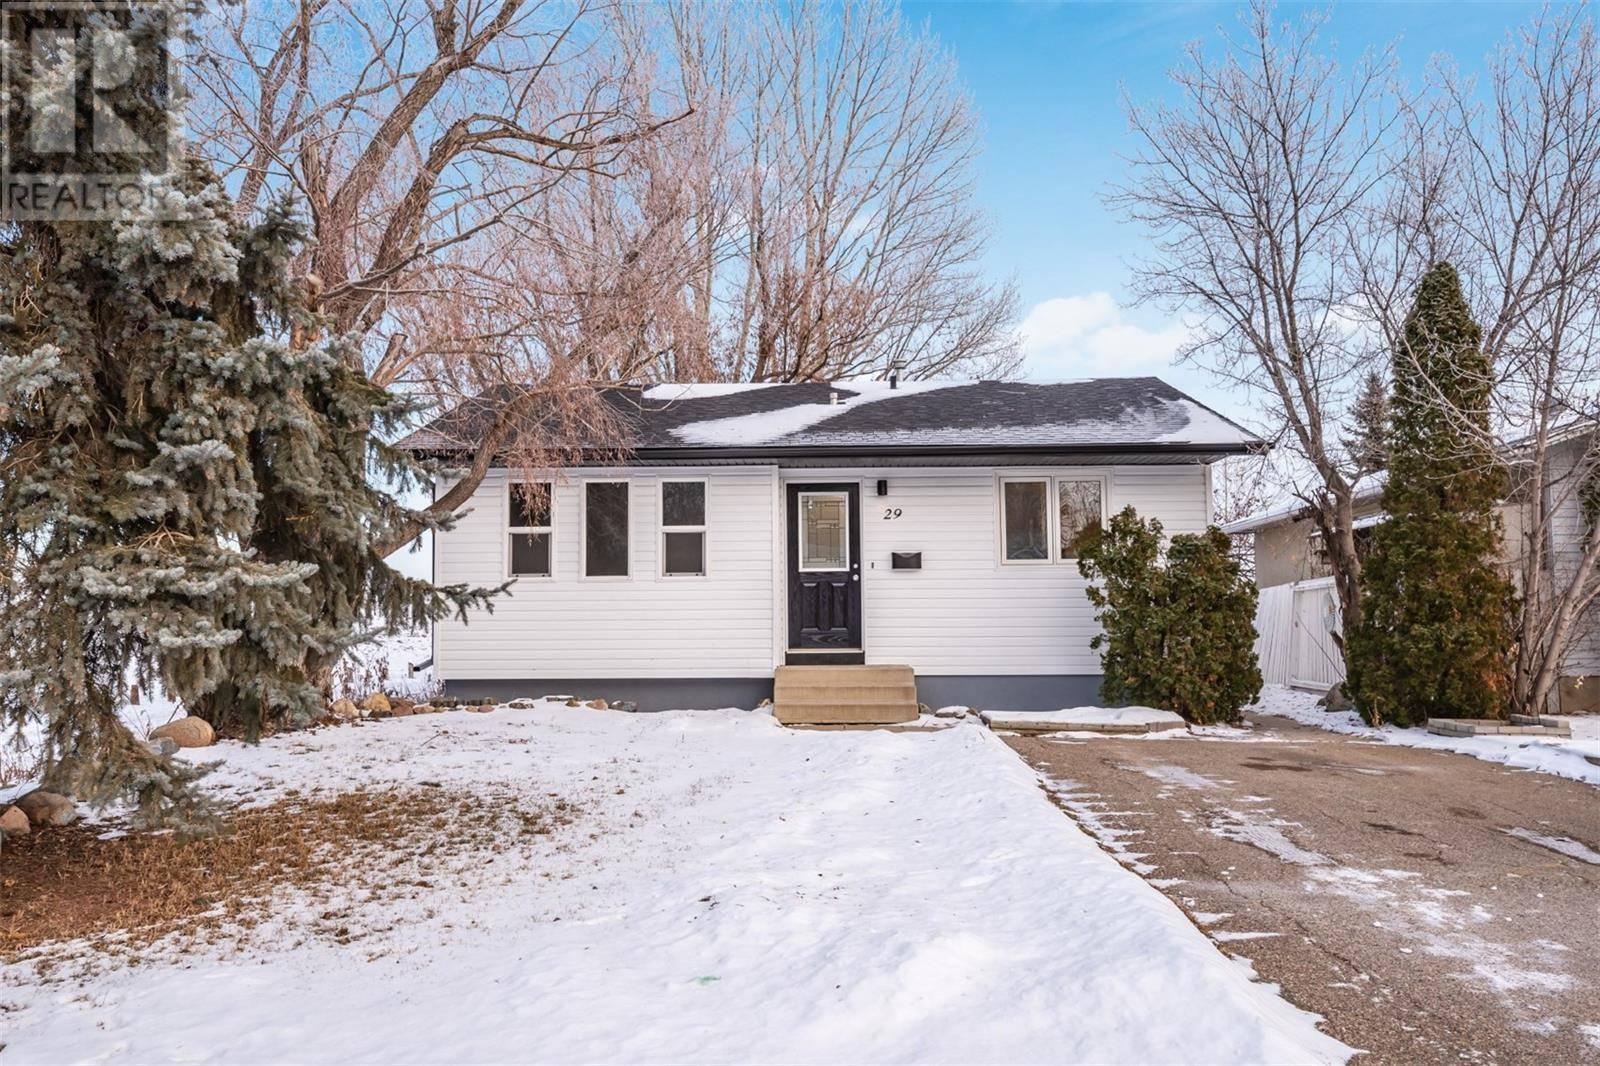 House for sale at 29 Moncton Pl Saskatoon Saskatchewan - MLS: SK793781